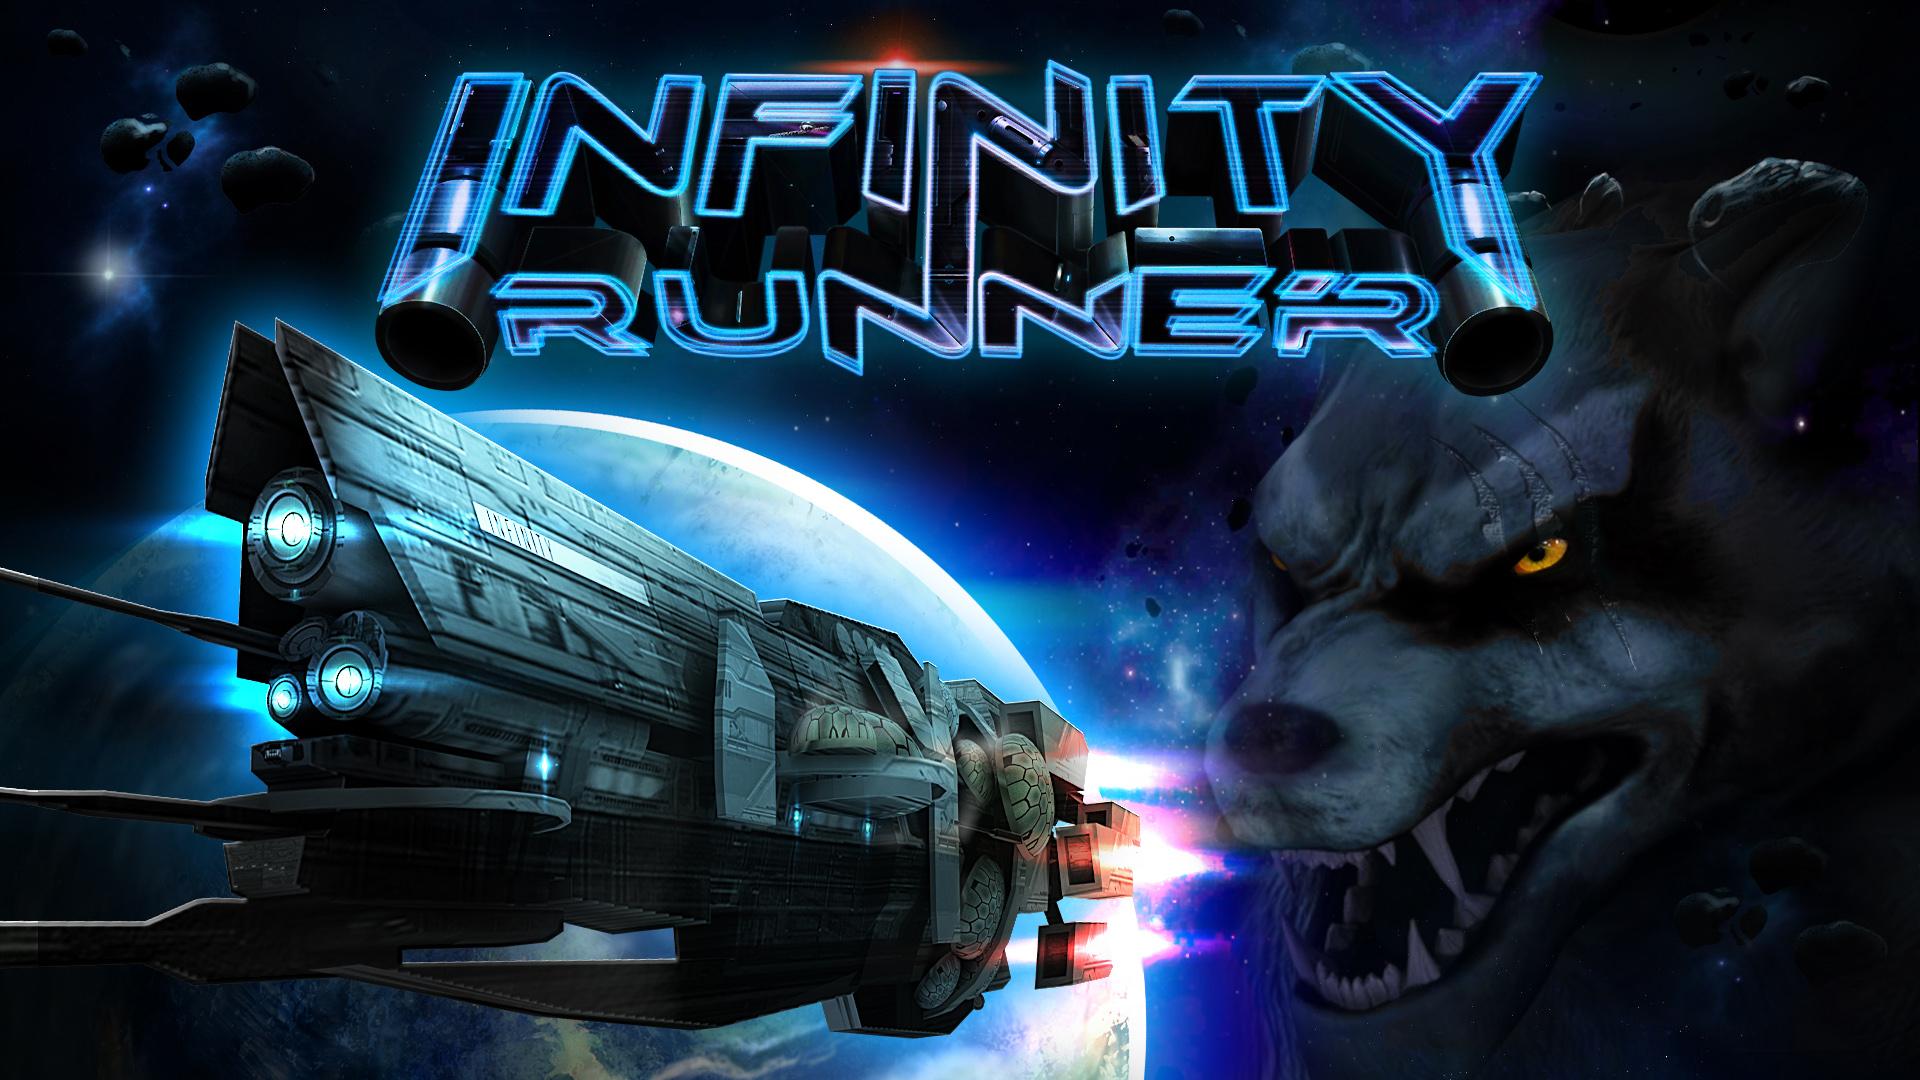 Review: Infinity Runner